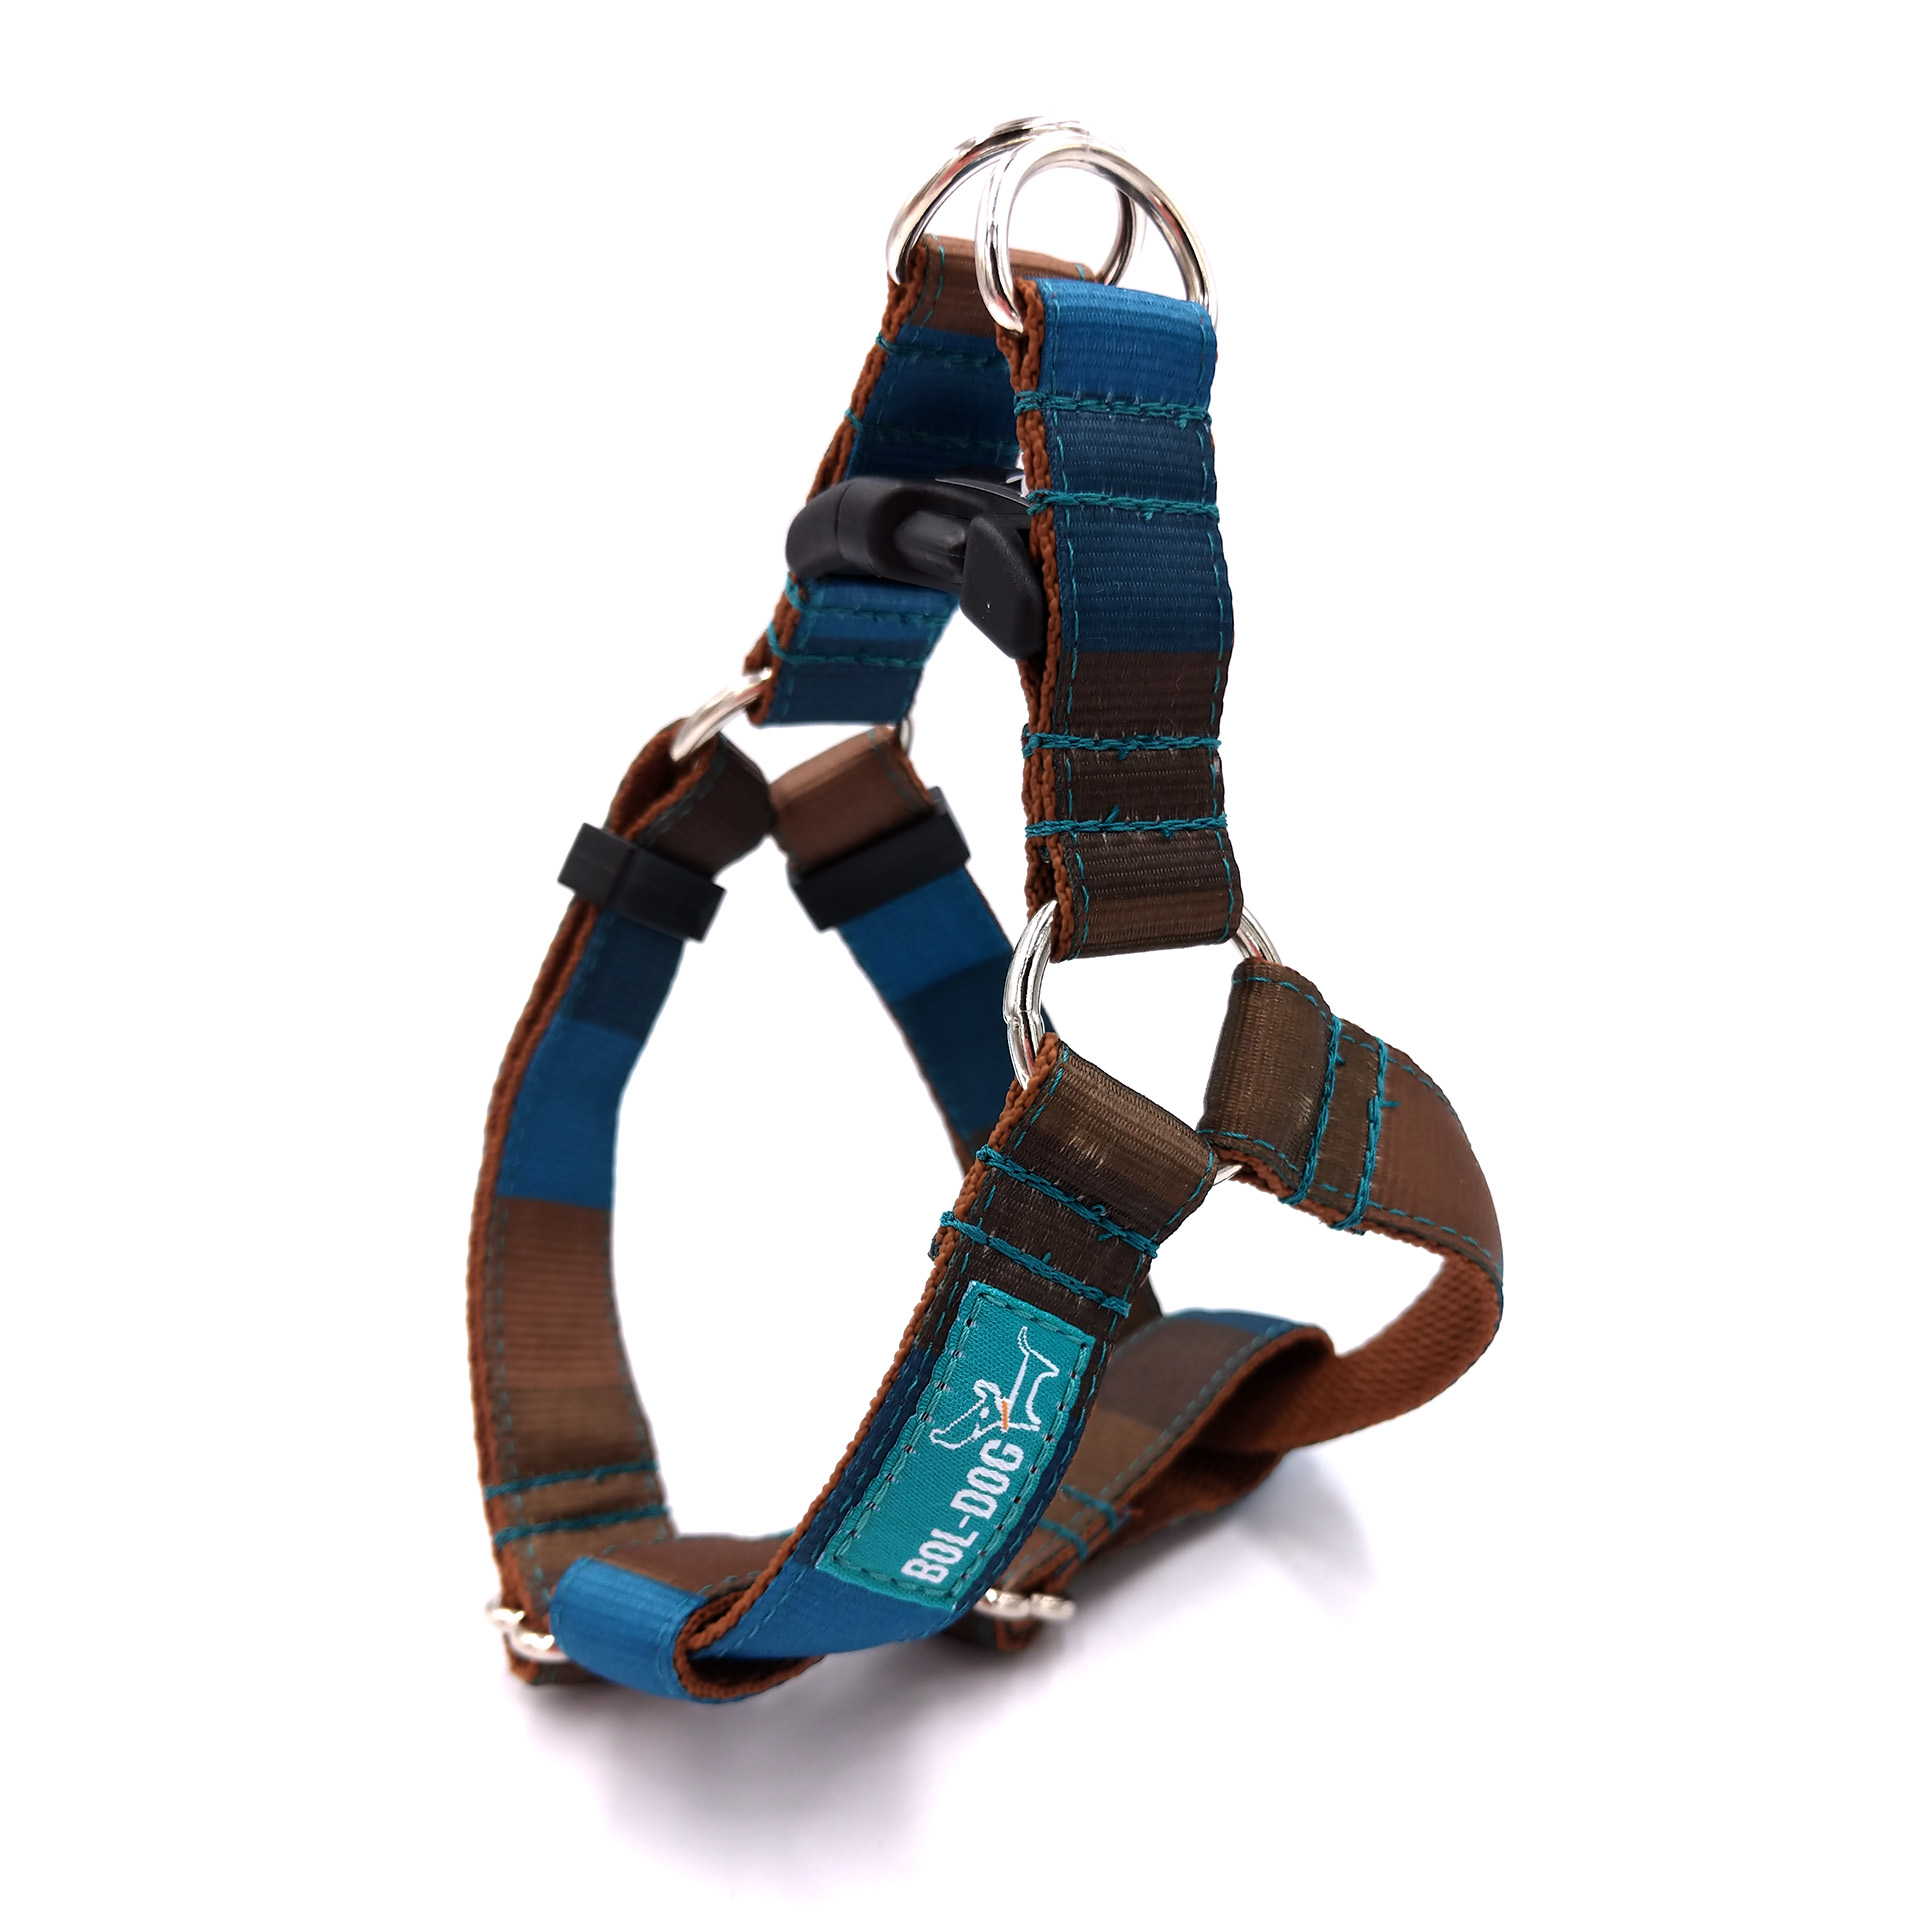 Brownblue dog harness